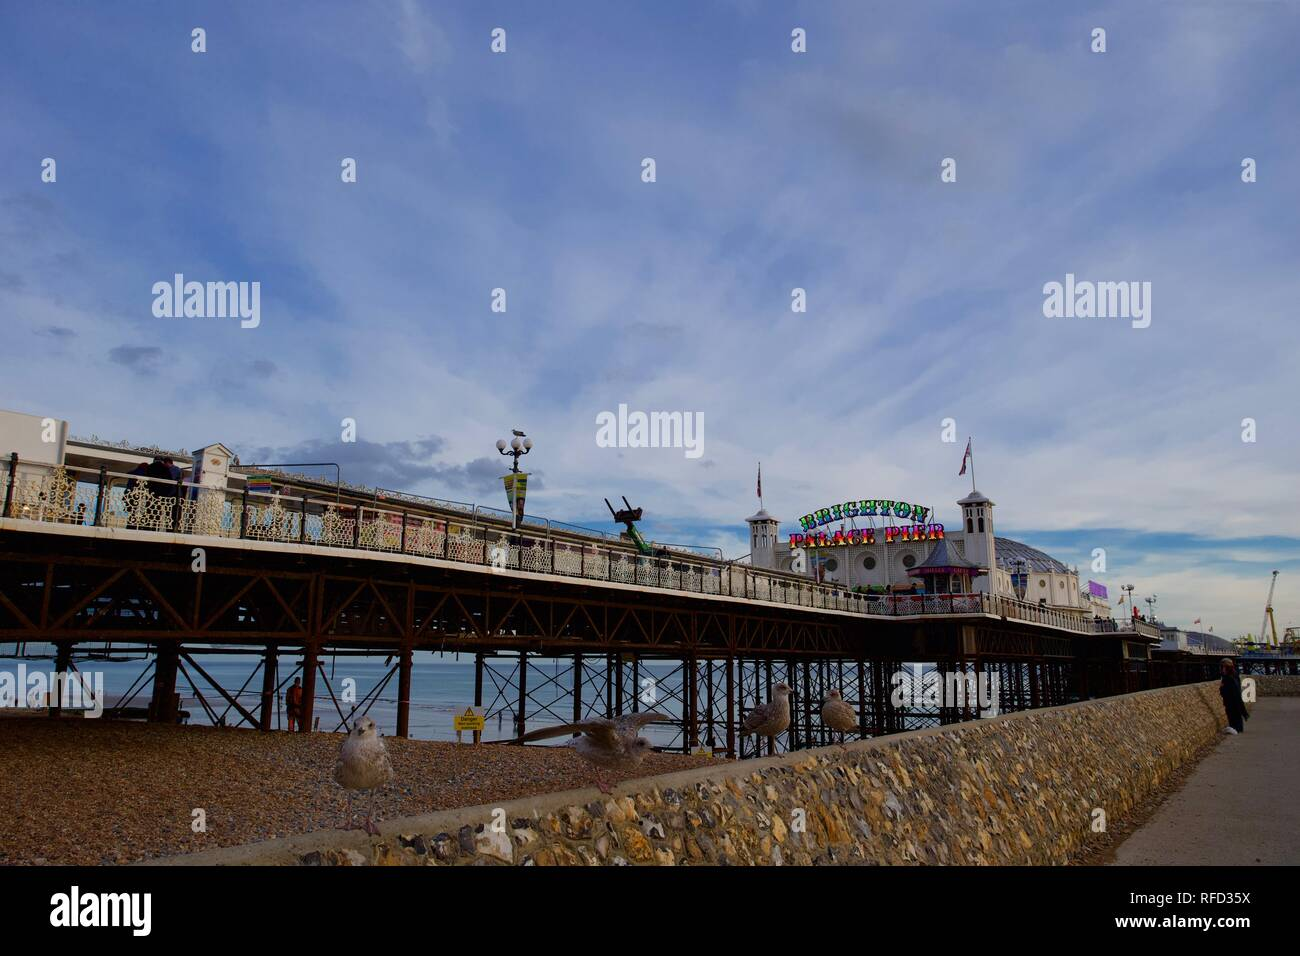 Brighton Palace Pier, Brighton, East Sussex, England. Stock Photo